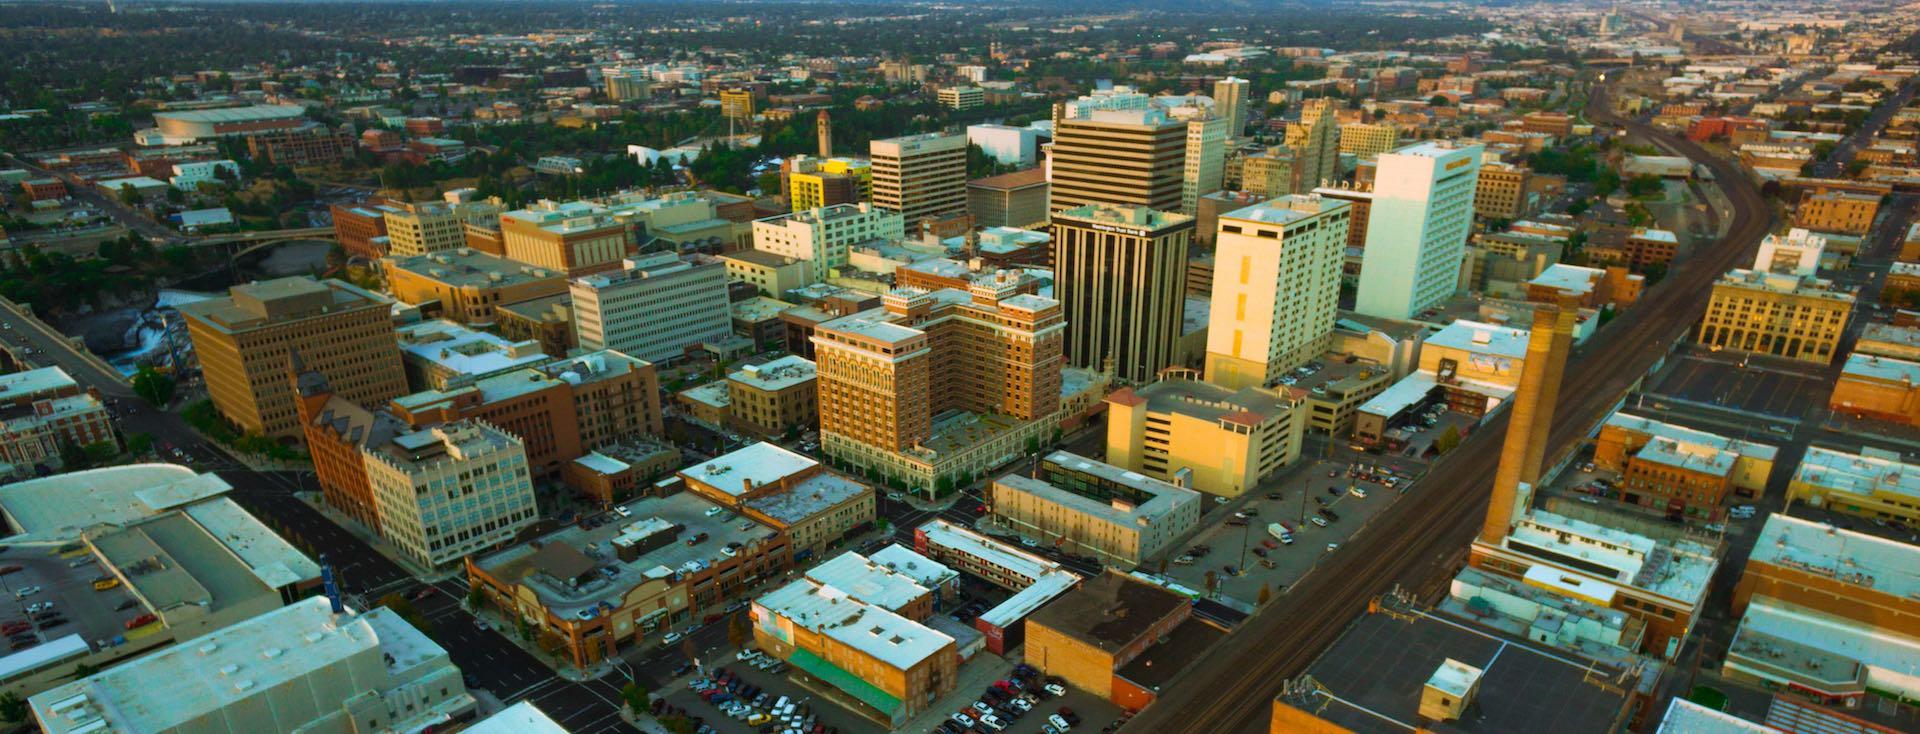 Relocation Guide 2021: Moving to Spokane, Washington